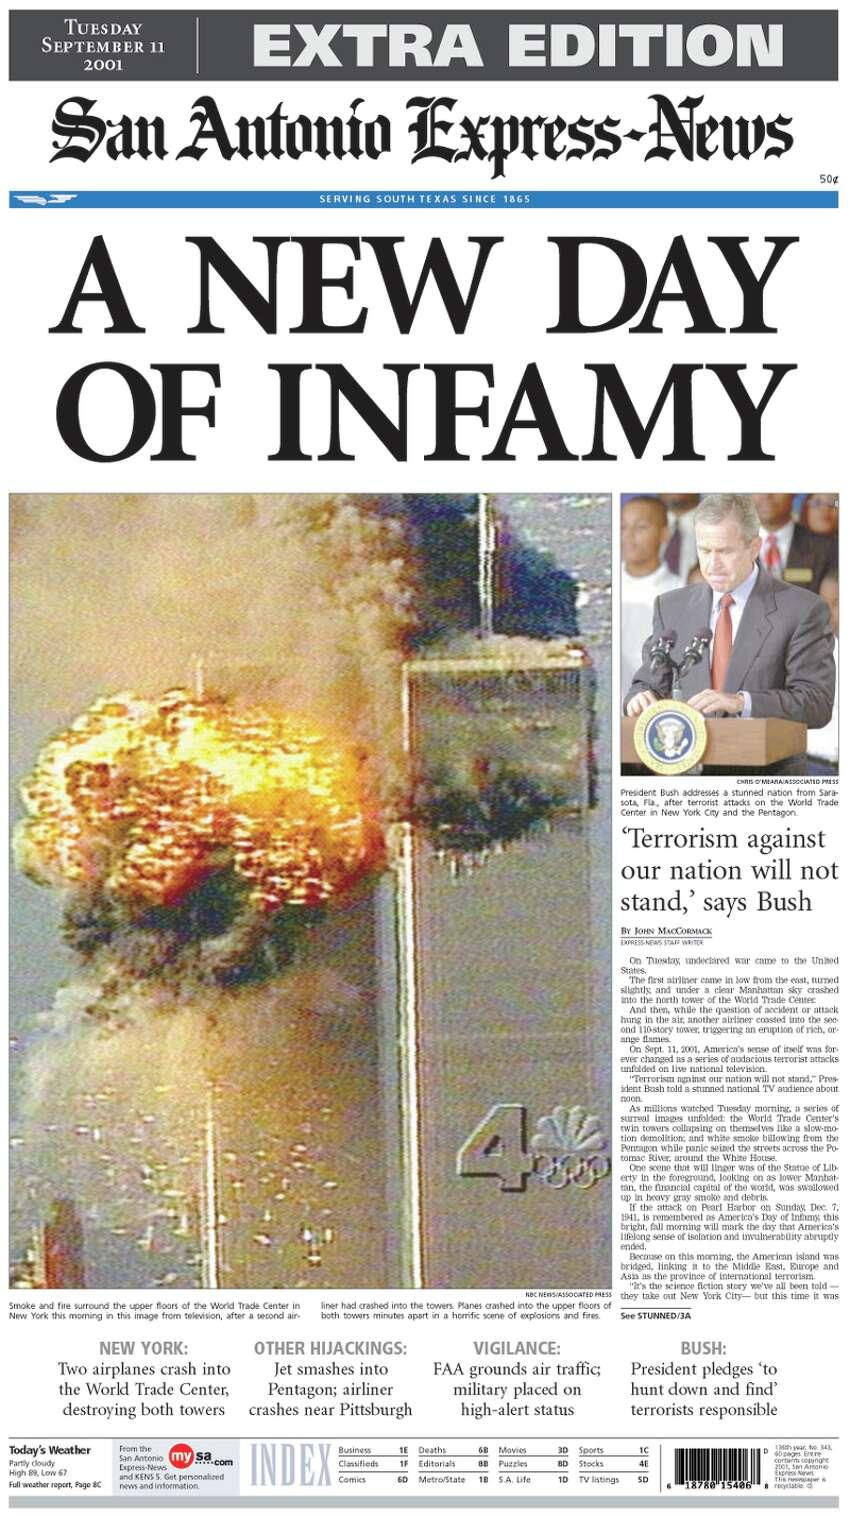 San Antonio Express-News September 11, 2001 Extra Edition front page. Headline: